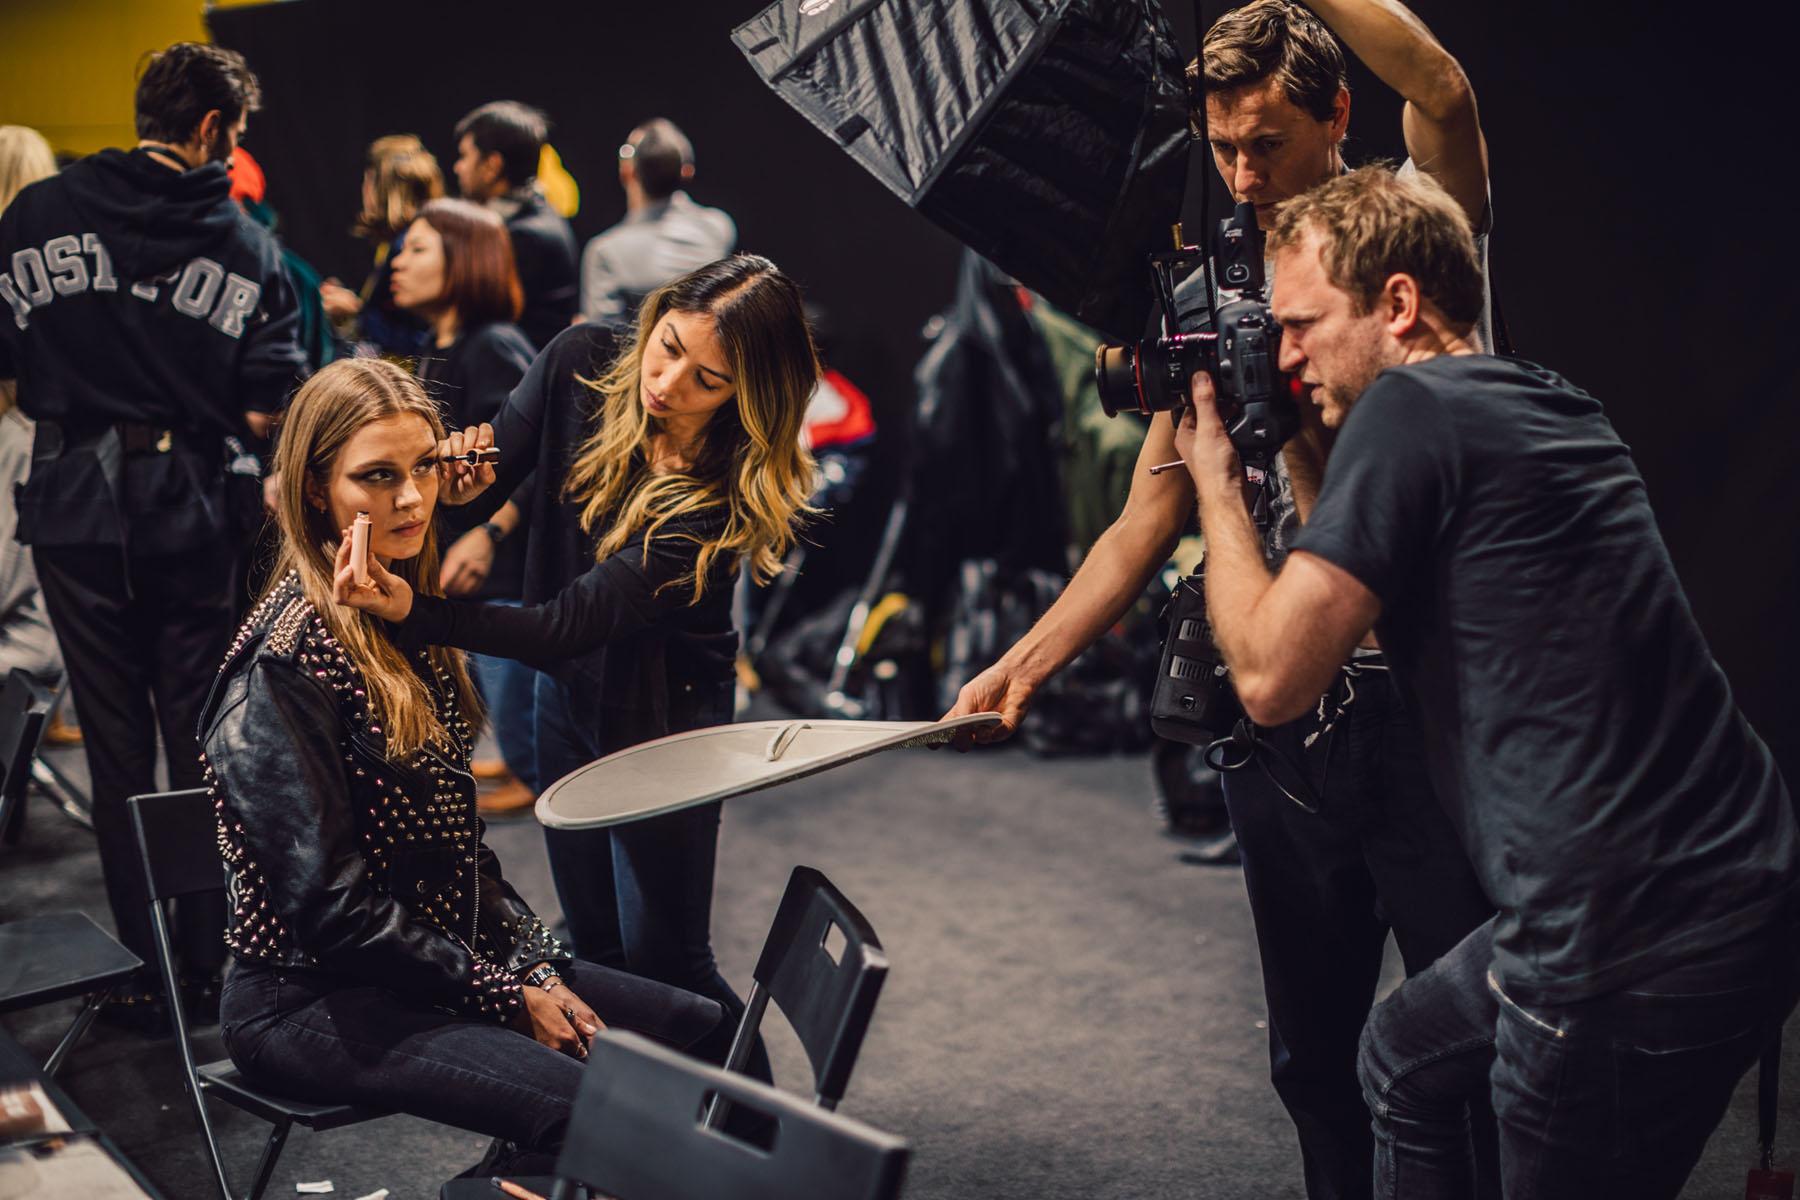 Milan Fashion Week - Backstage at Tommy Hilfiger // Notjessfashion.com